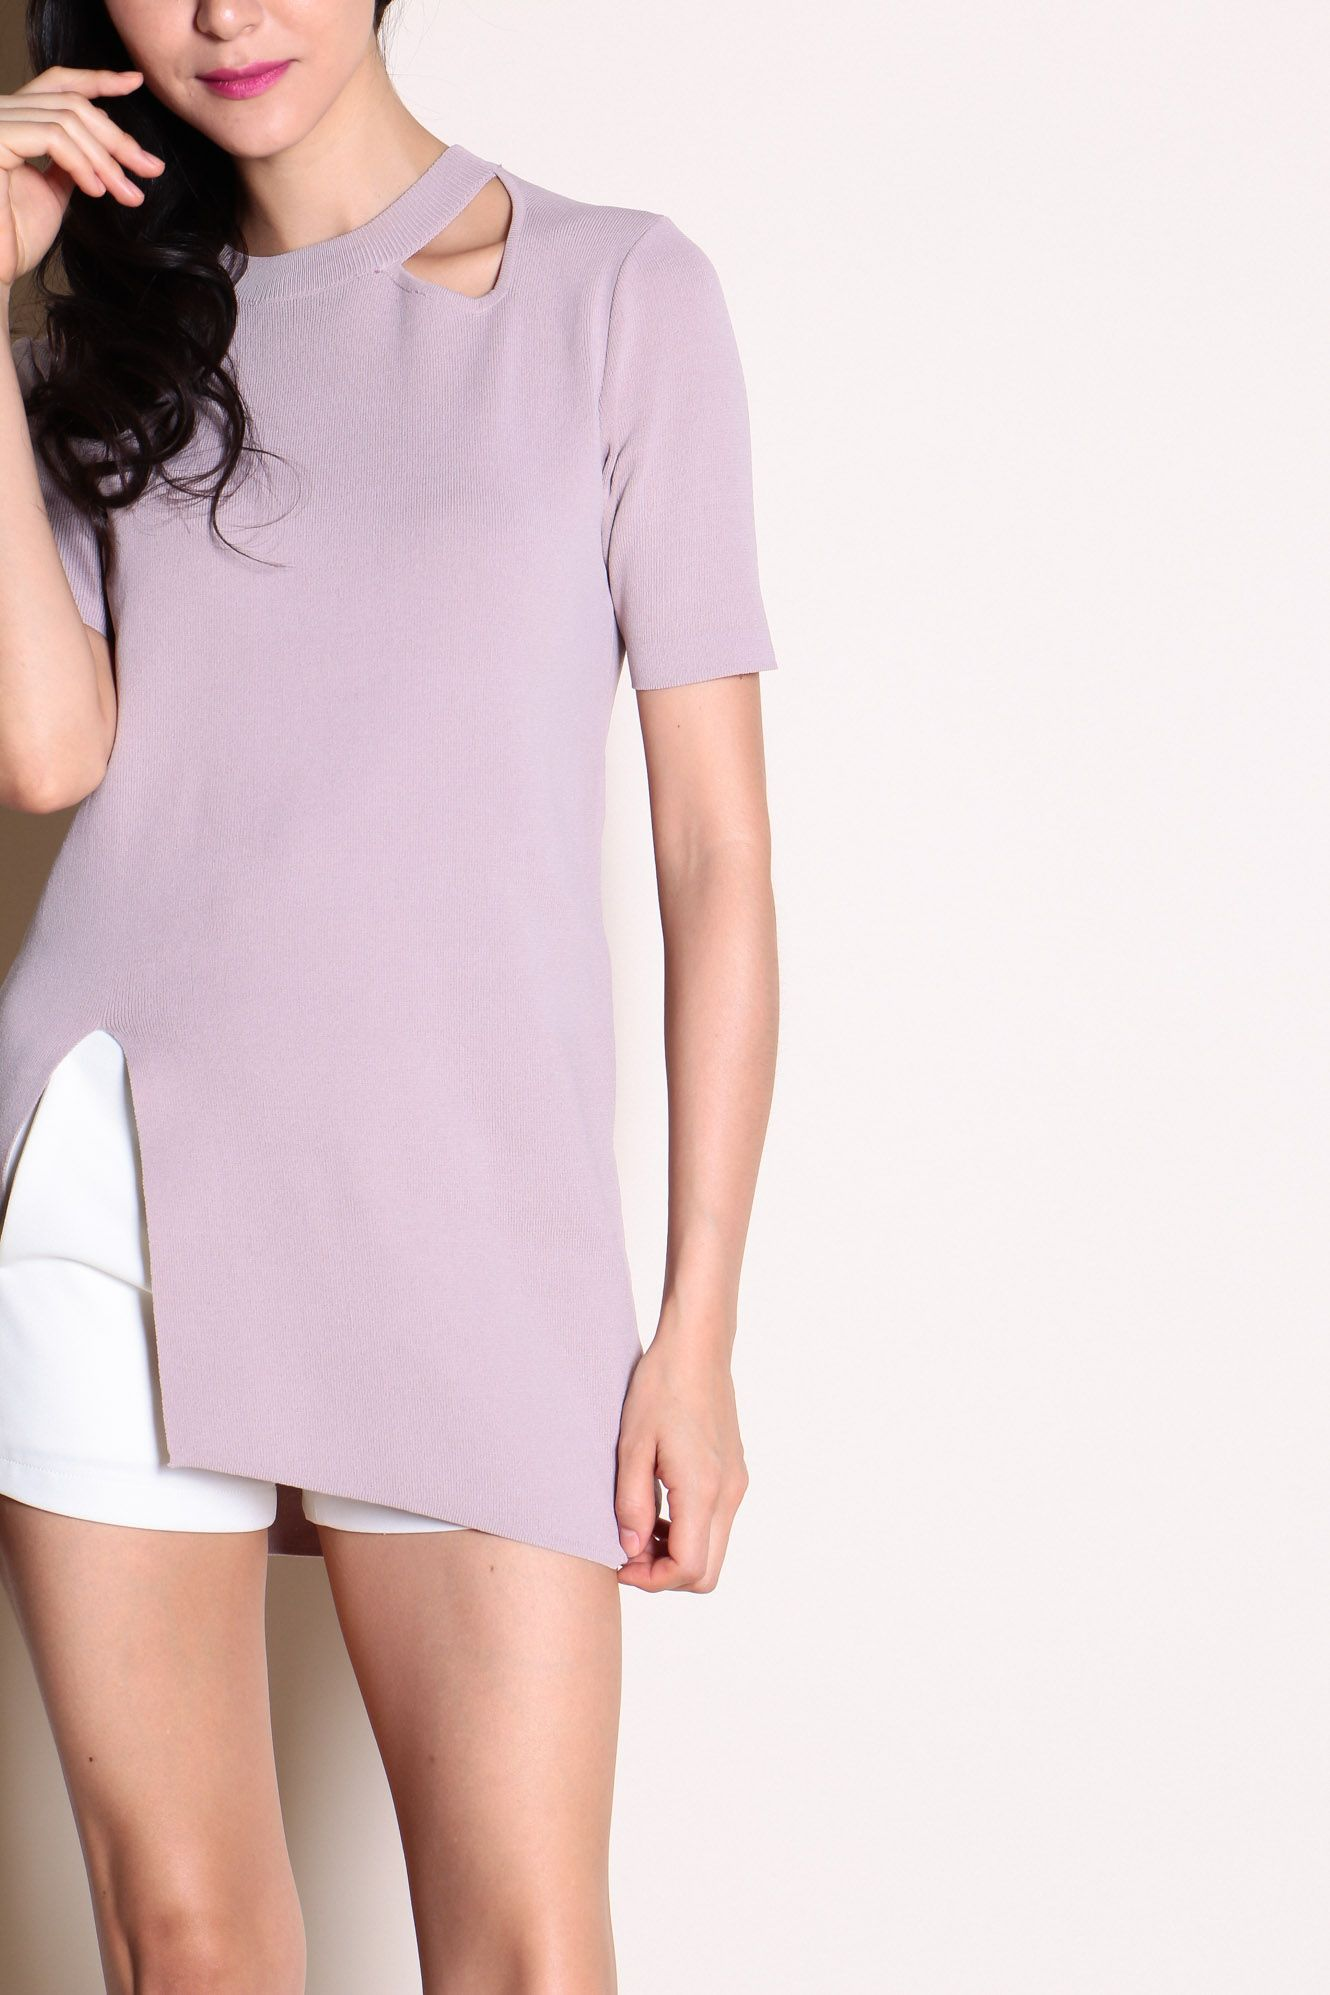 Cut-Out Slit Hem Tunic (Dusty Pink) SGD$ 30.00